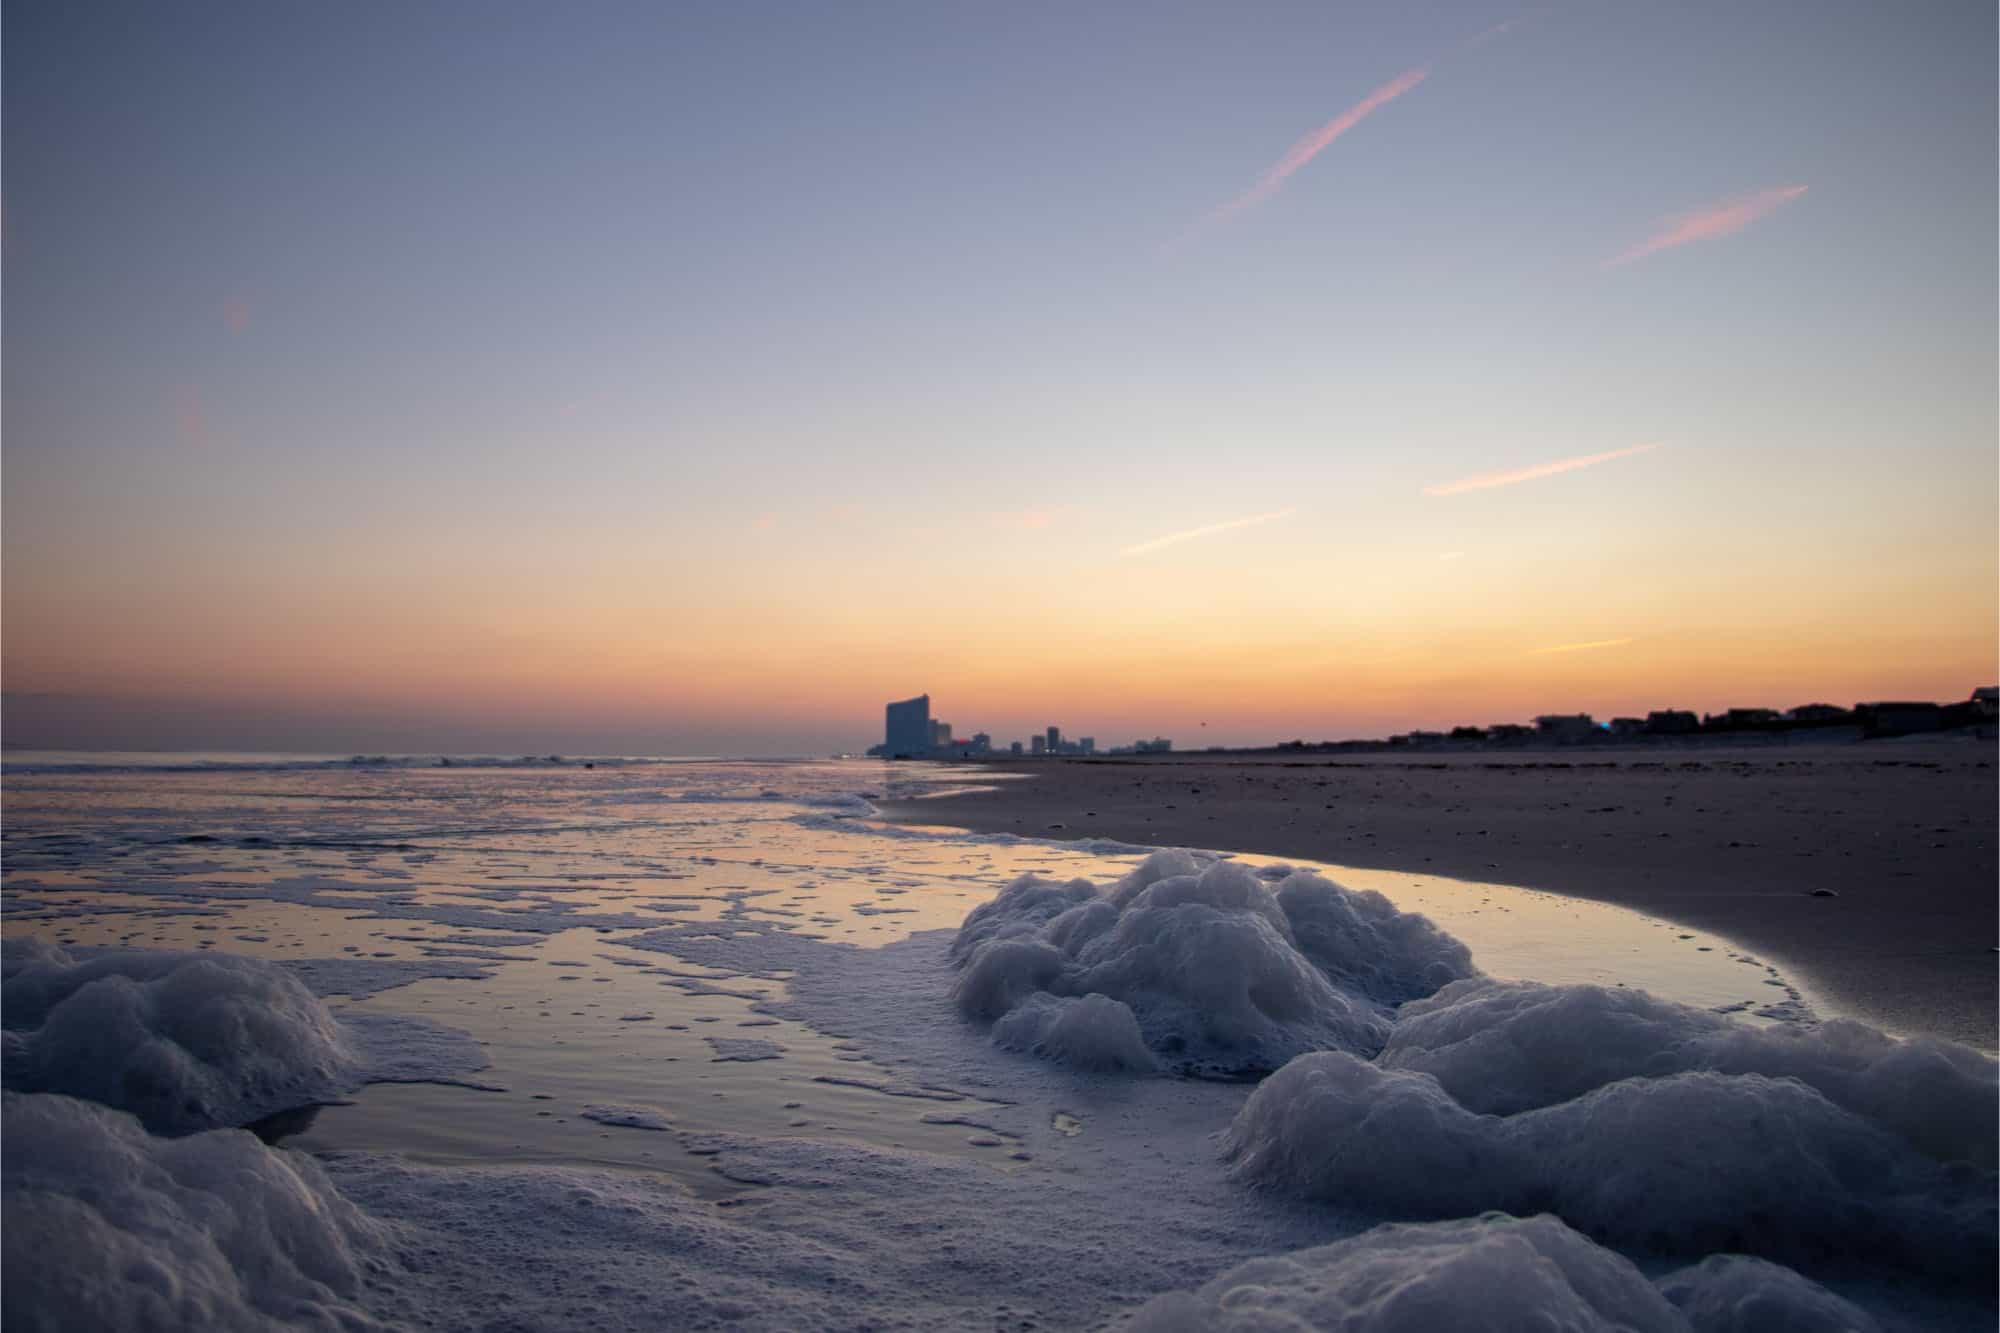 Receding tide on beach